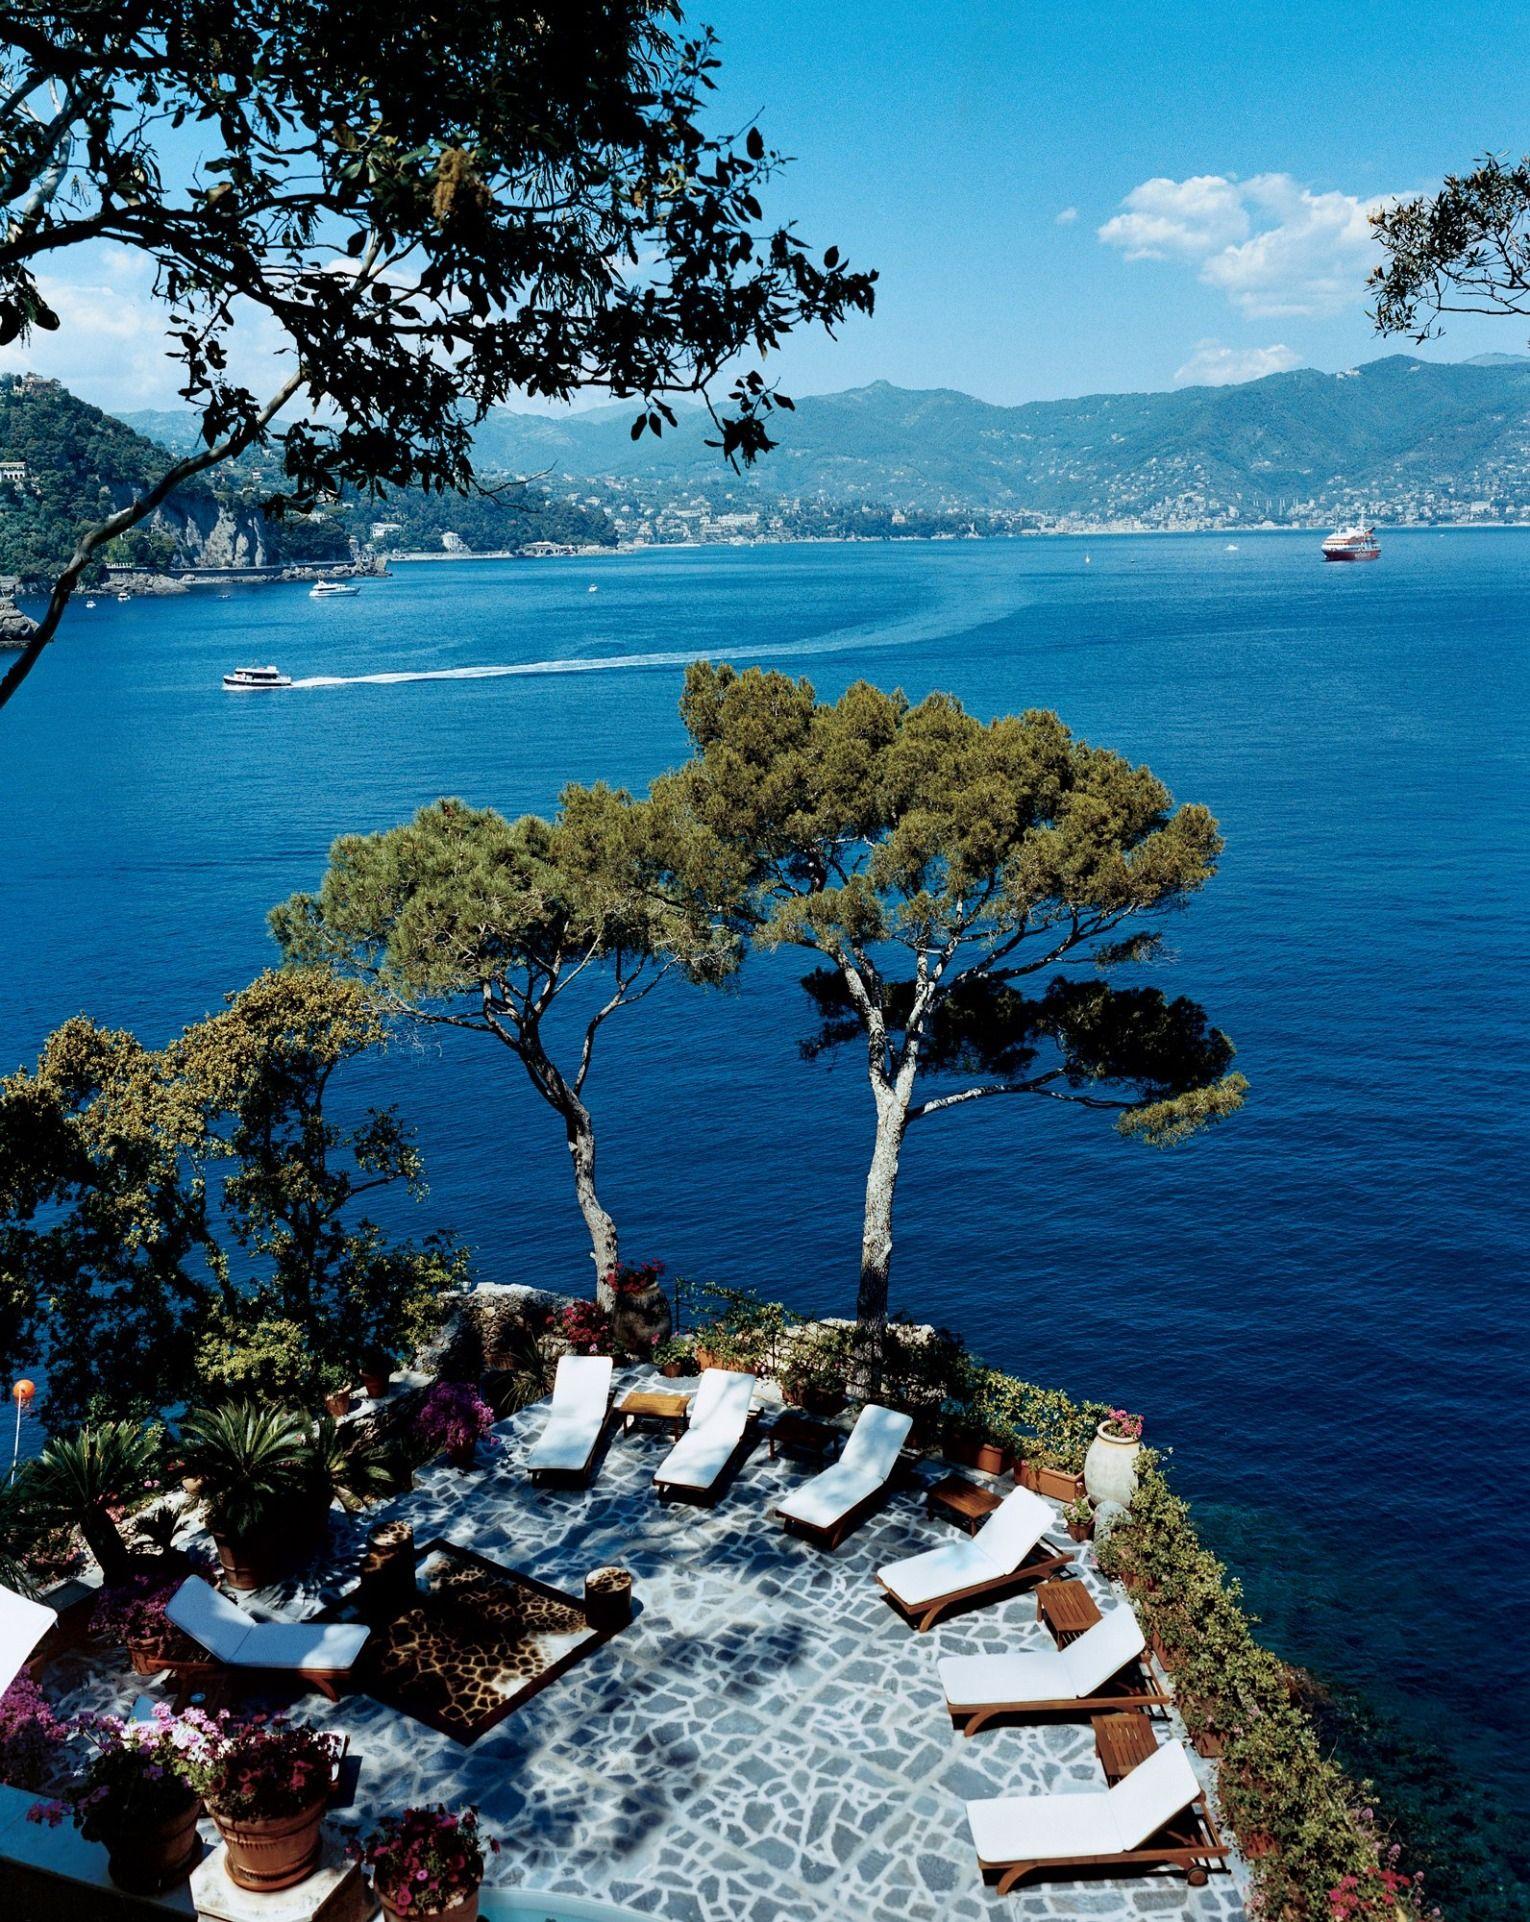 The terrace of Domenico Dolce and Stefano Gabbana's Portofino home, Villa Olivetta. Photographed by François Halard, Vogue, 2005.